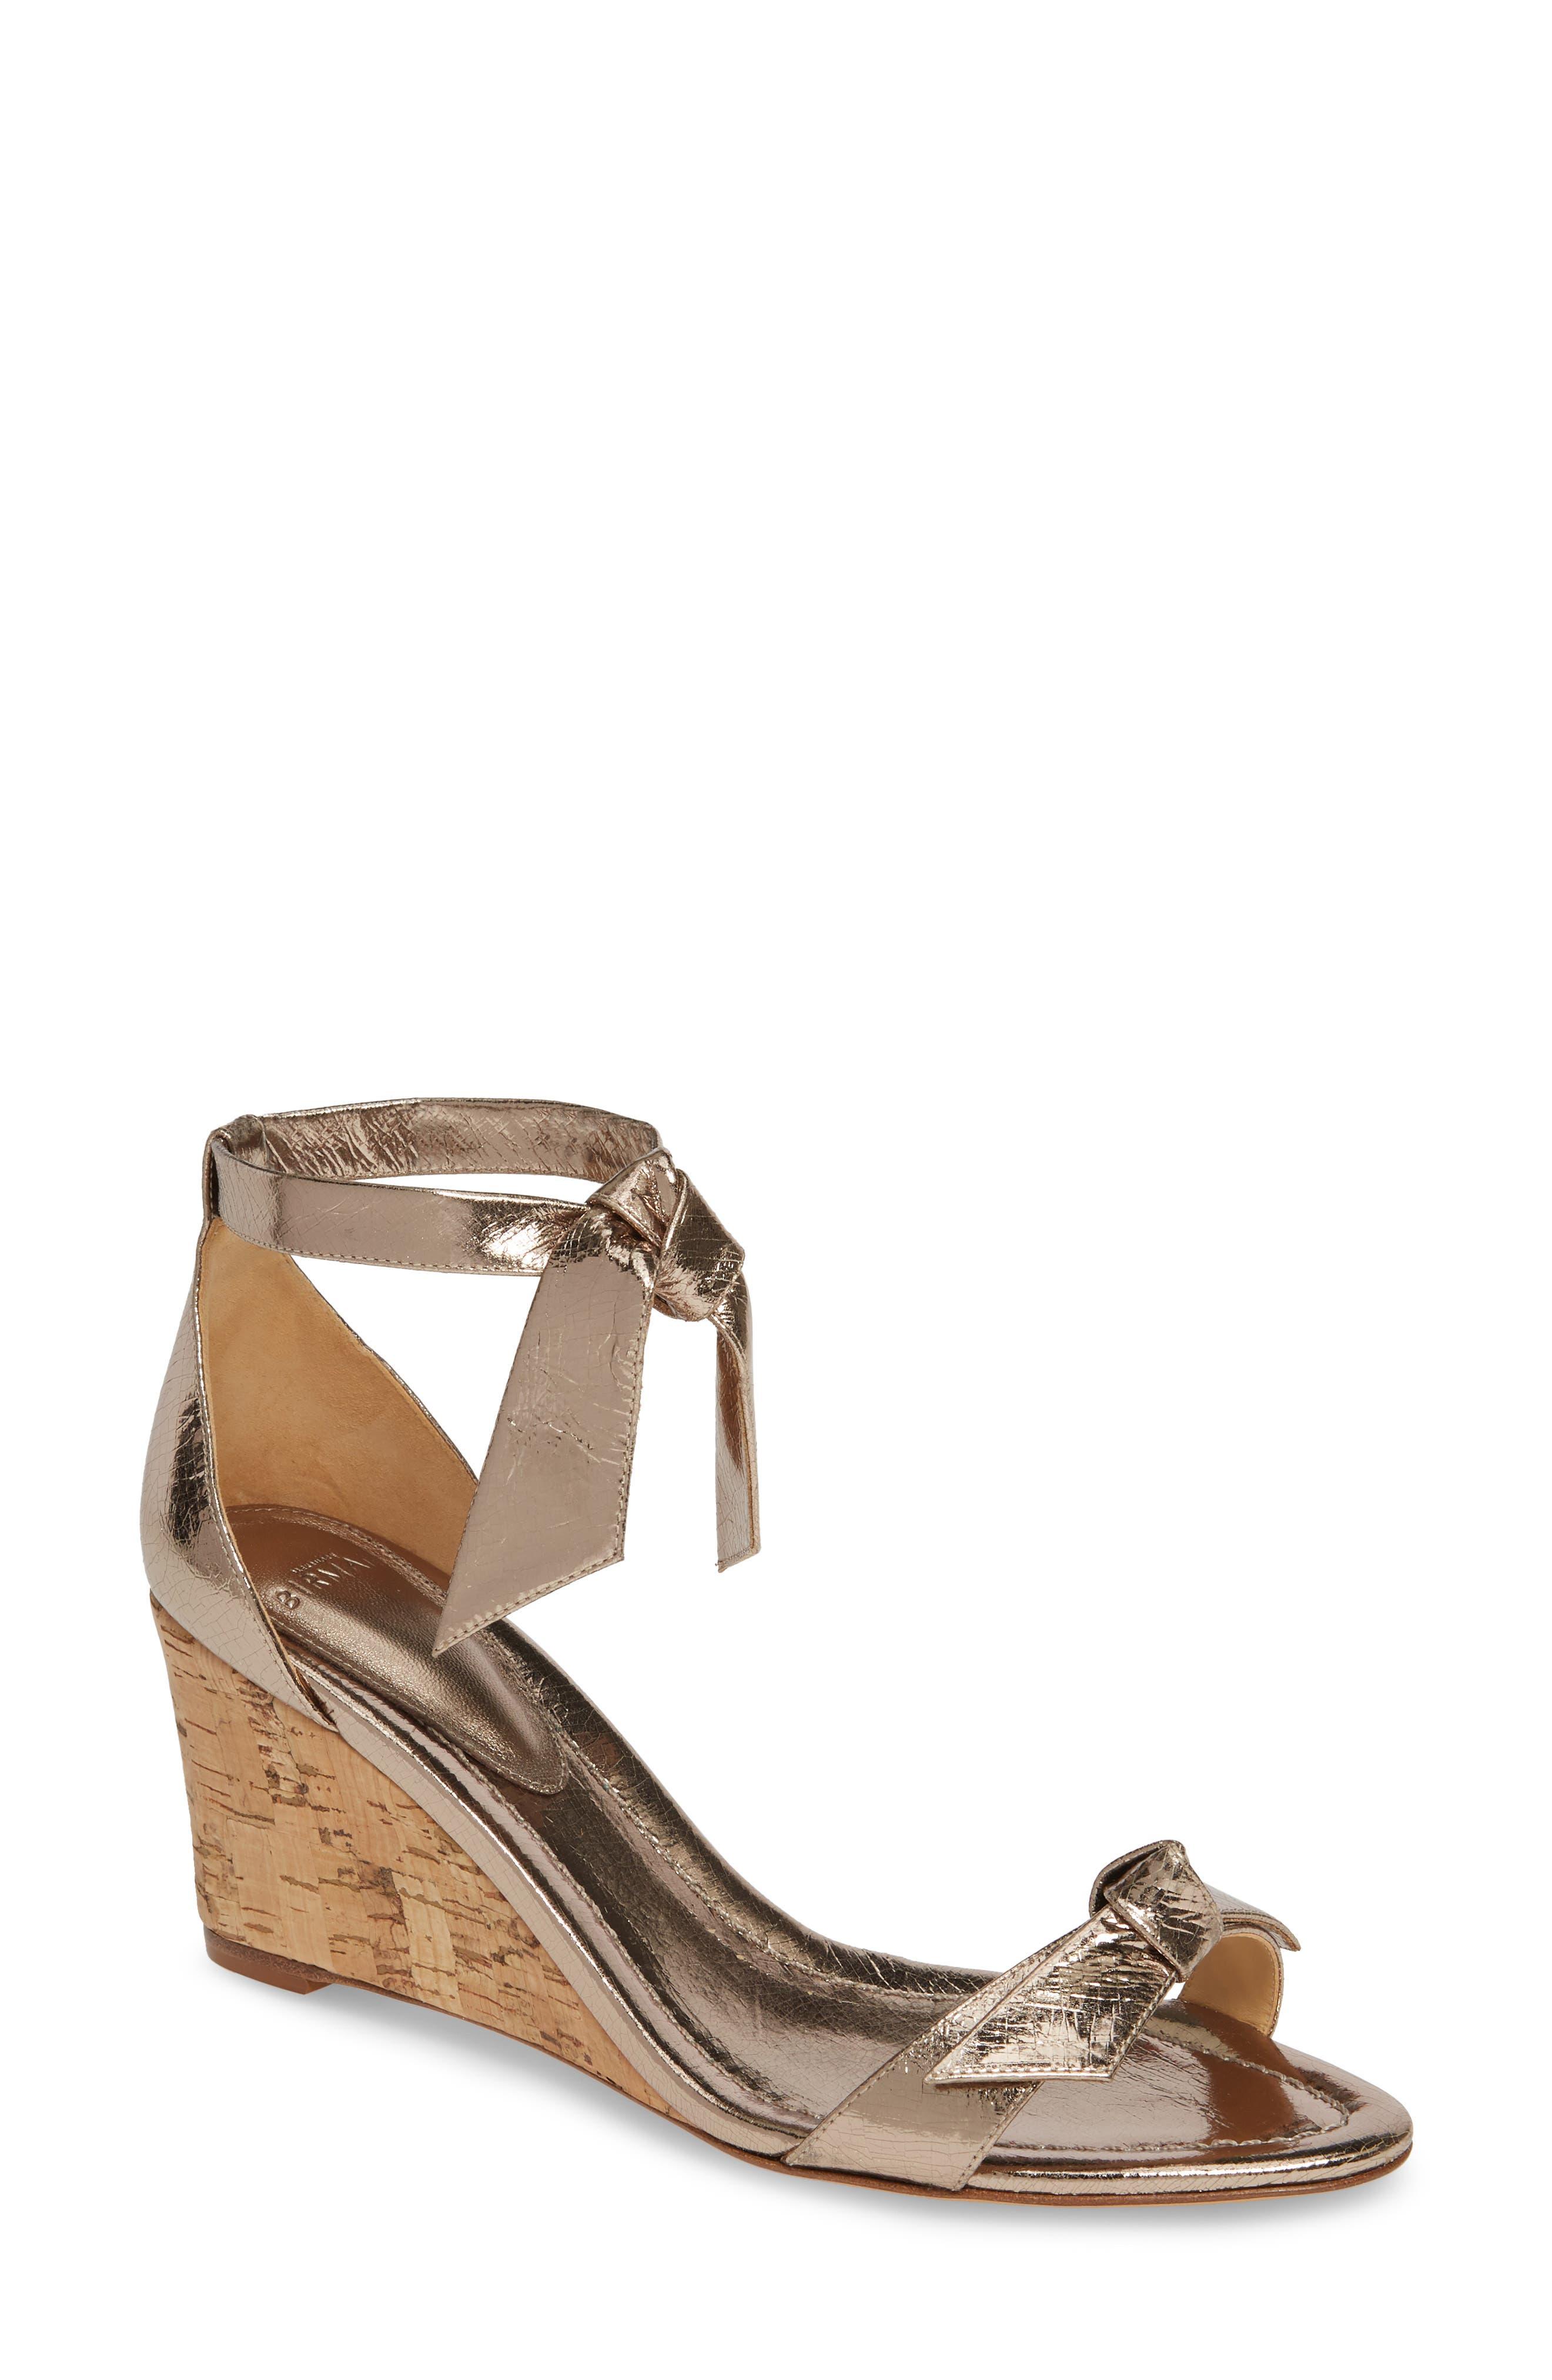 ALEXANDRE BIRMAN Clarita Wedge Sandal, Main, color, LUNA/ NATURAL